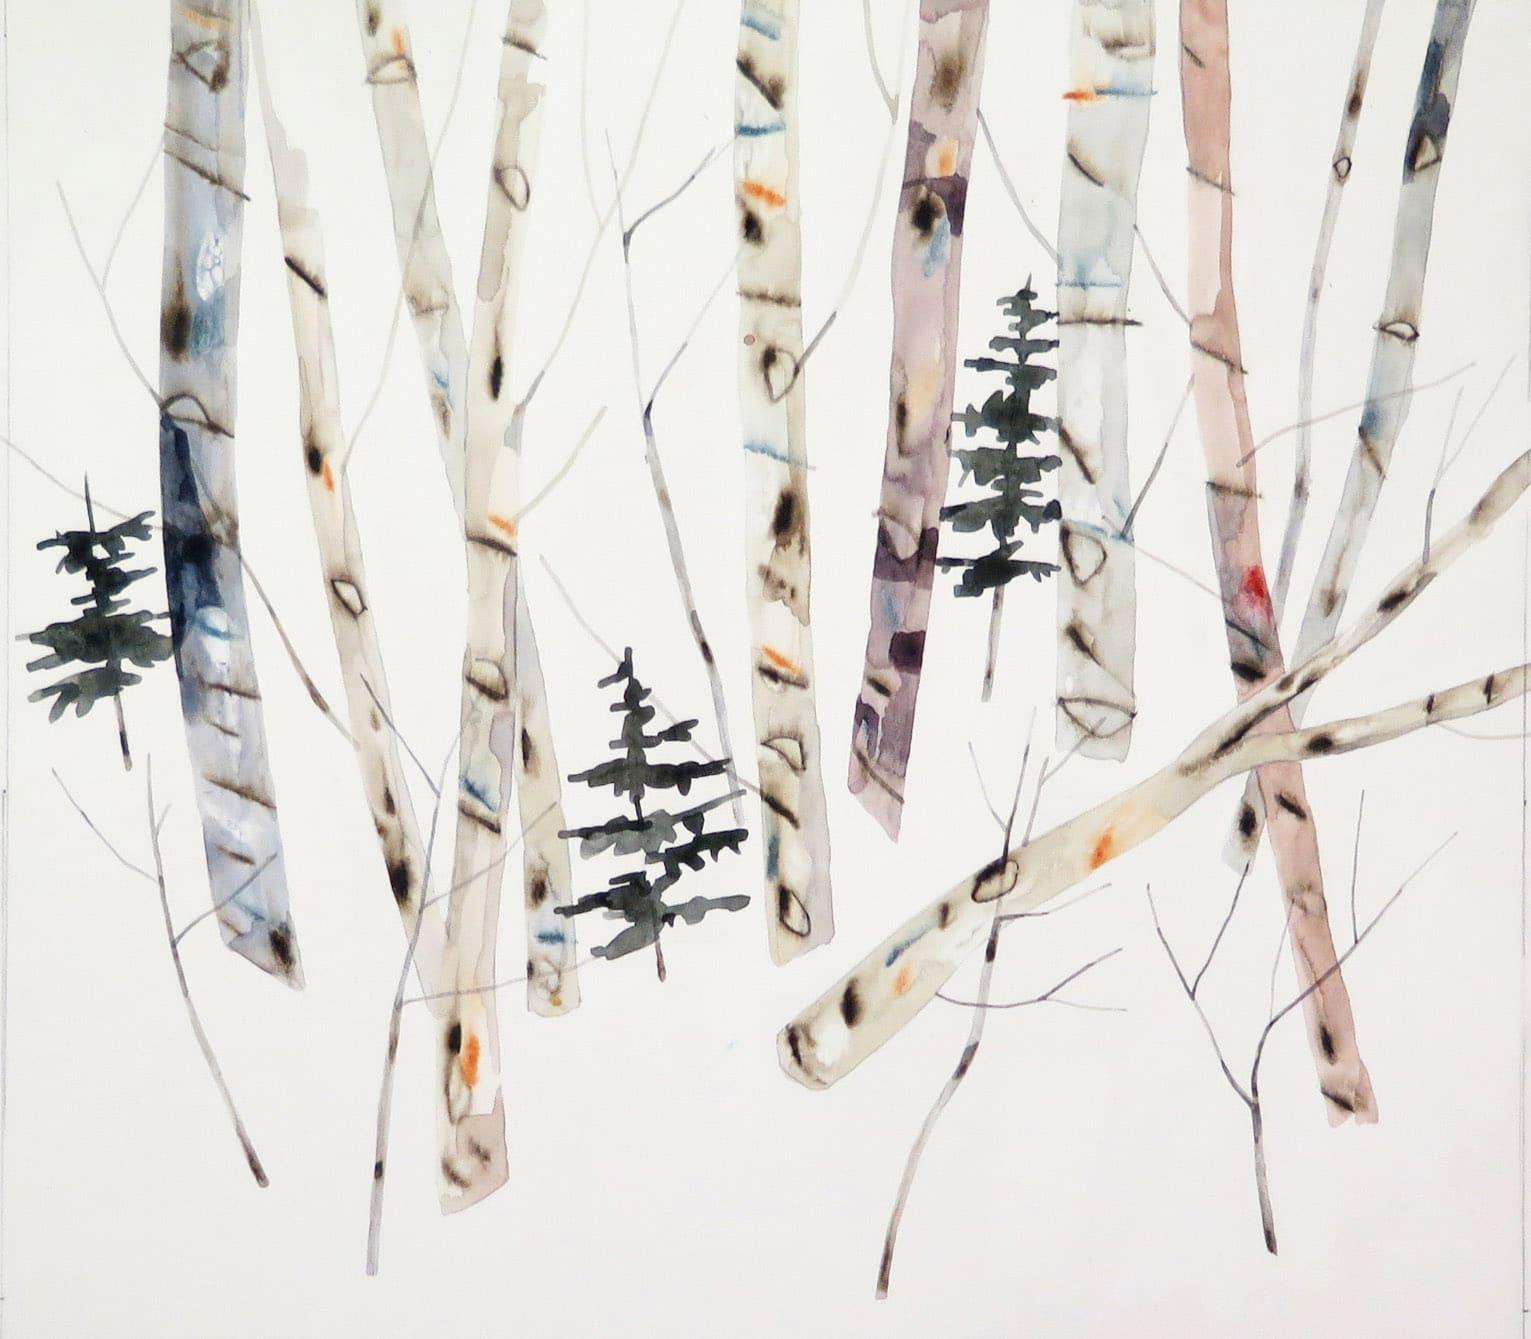 Kate Evans Birch & Pines, 47x51cm copy